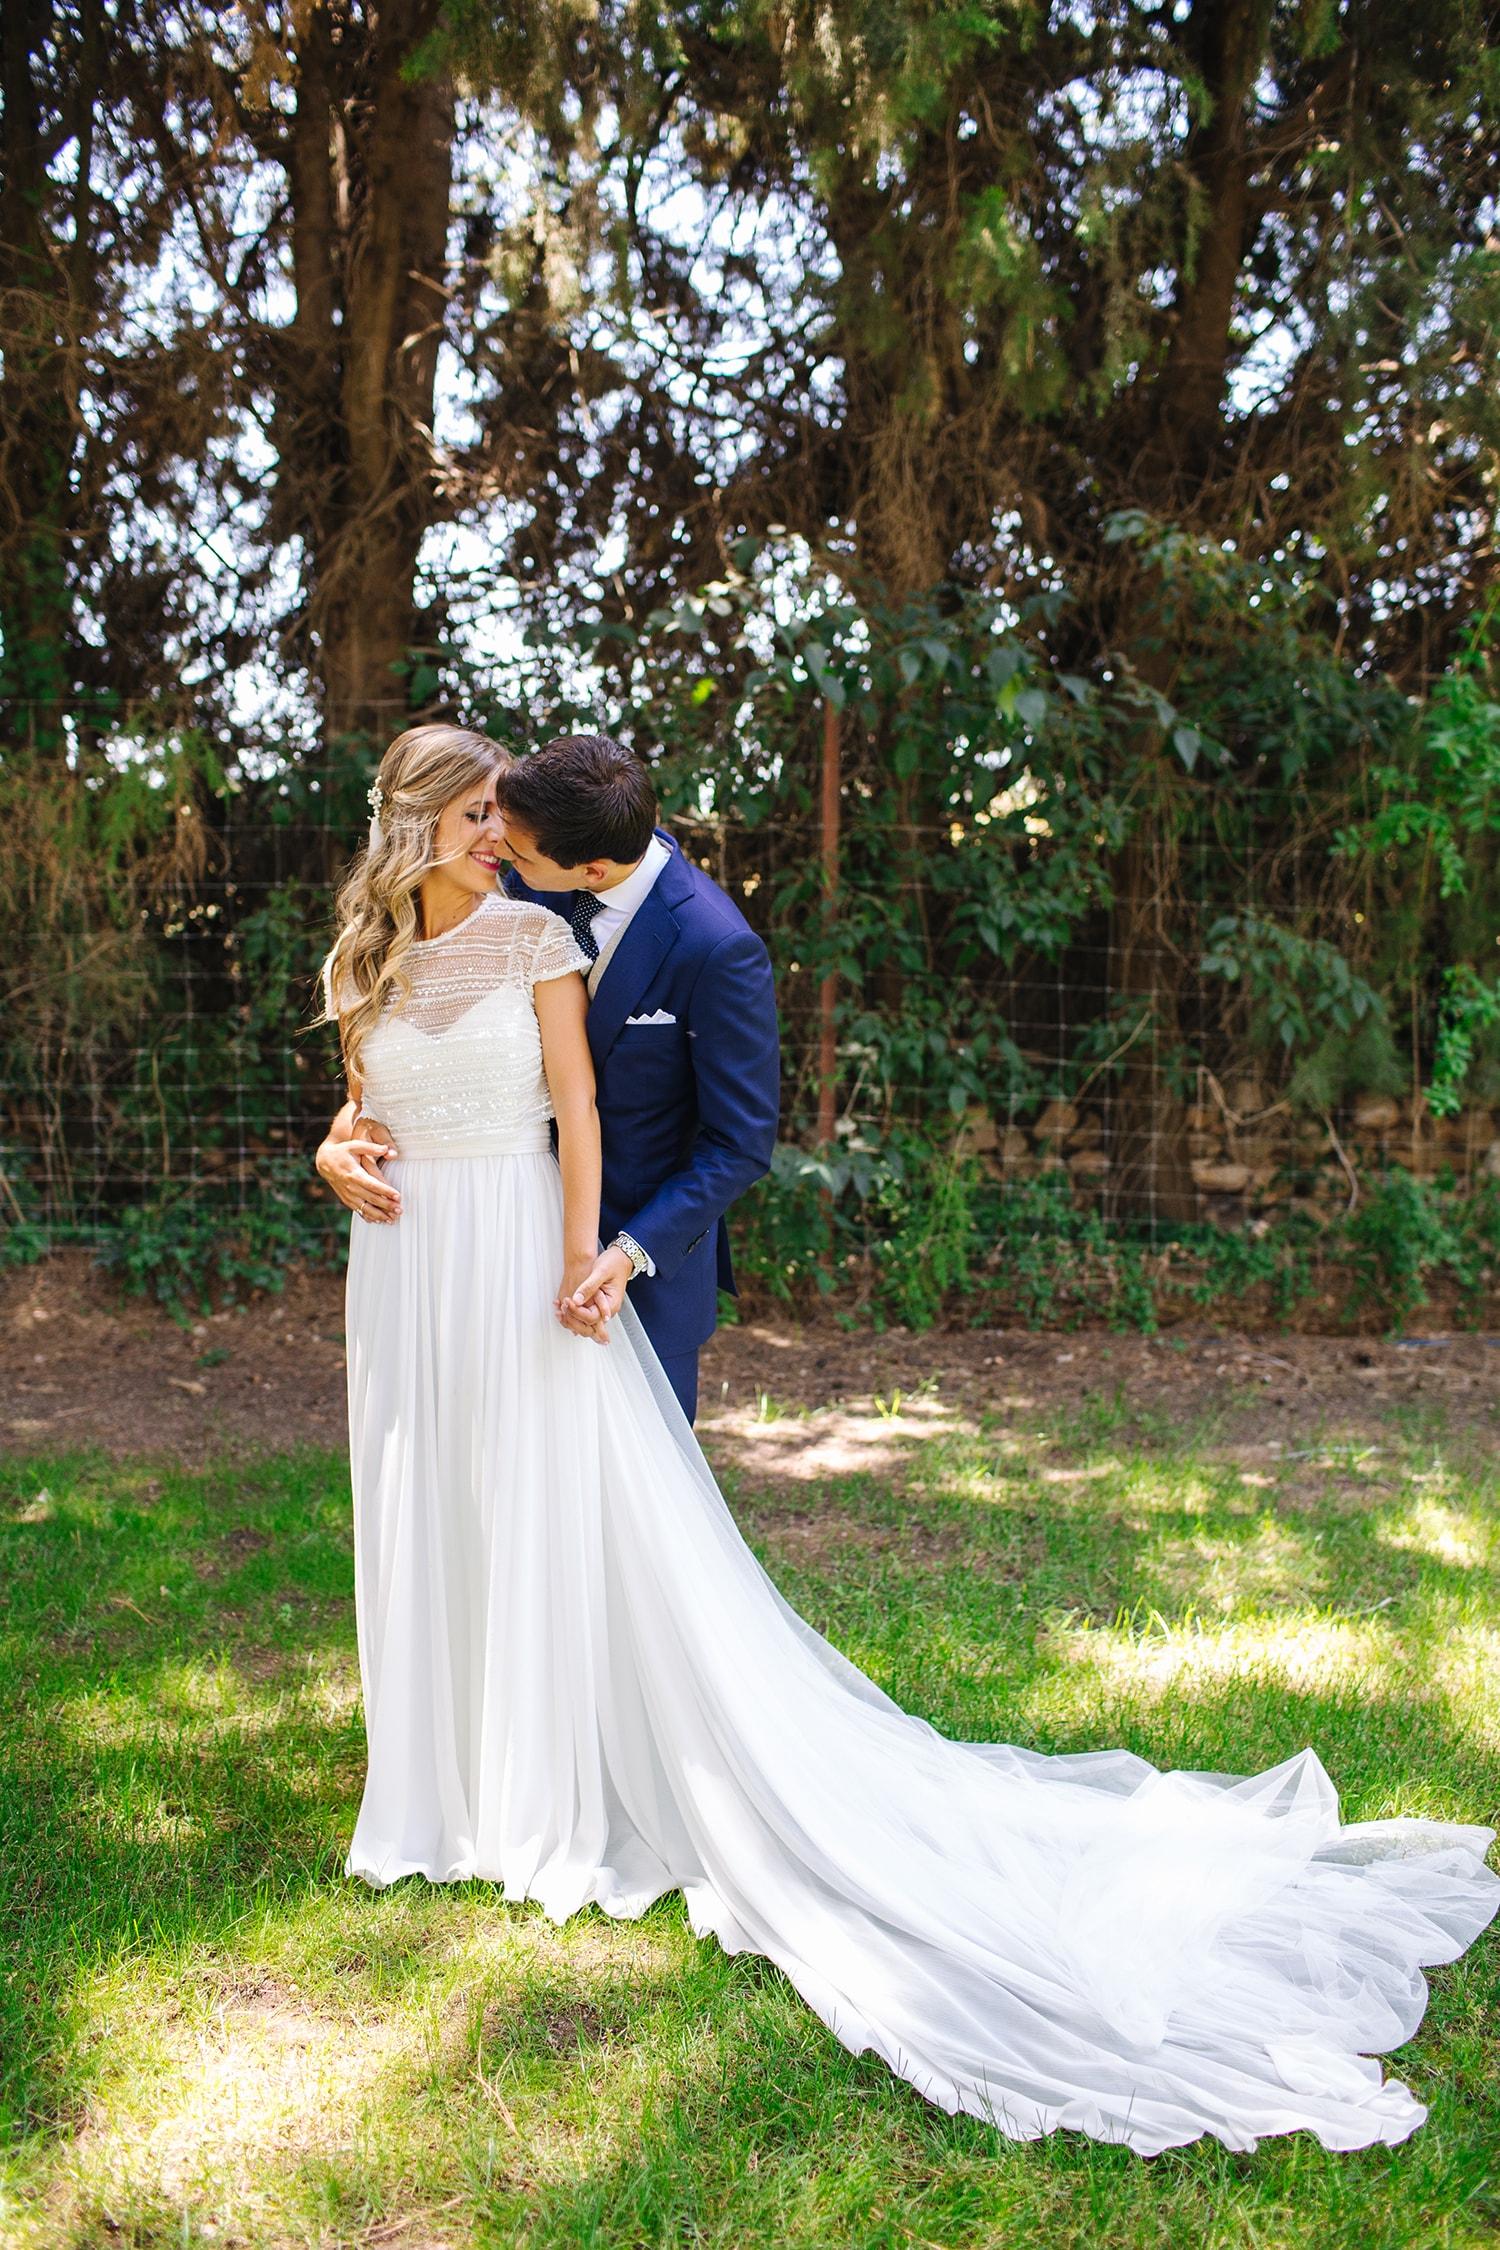 paulagfurio_bouganvillea_wedding_spain_005.jpg